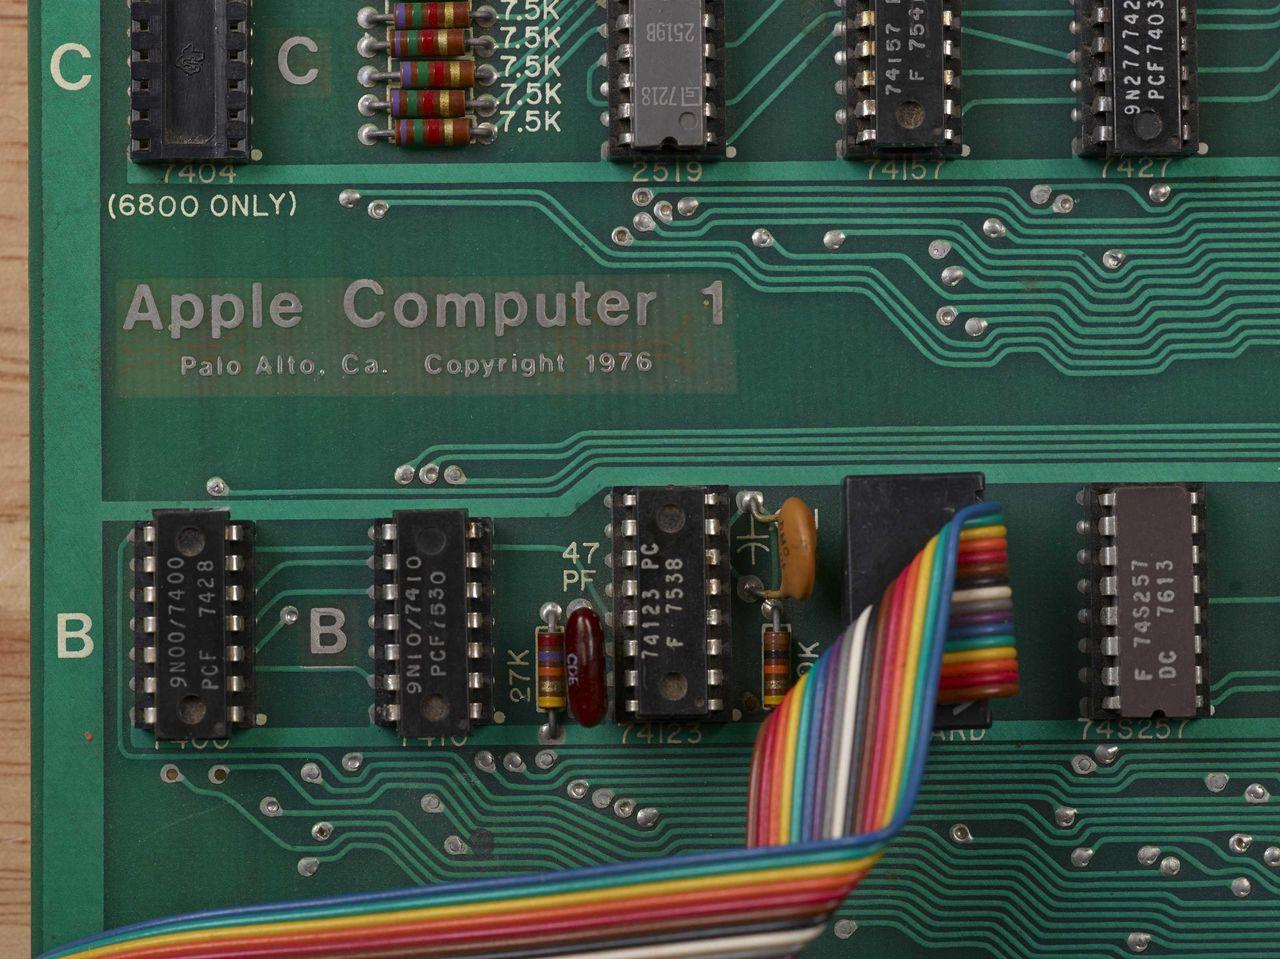 Forsta apple datorn auktioneras ut